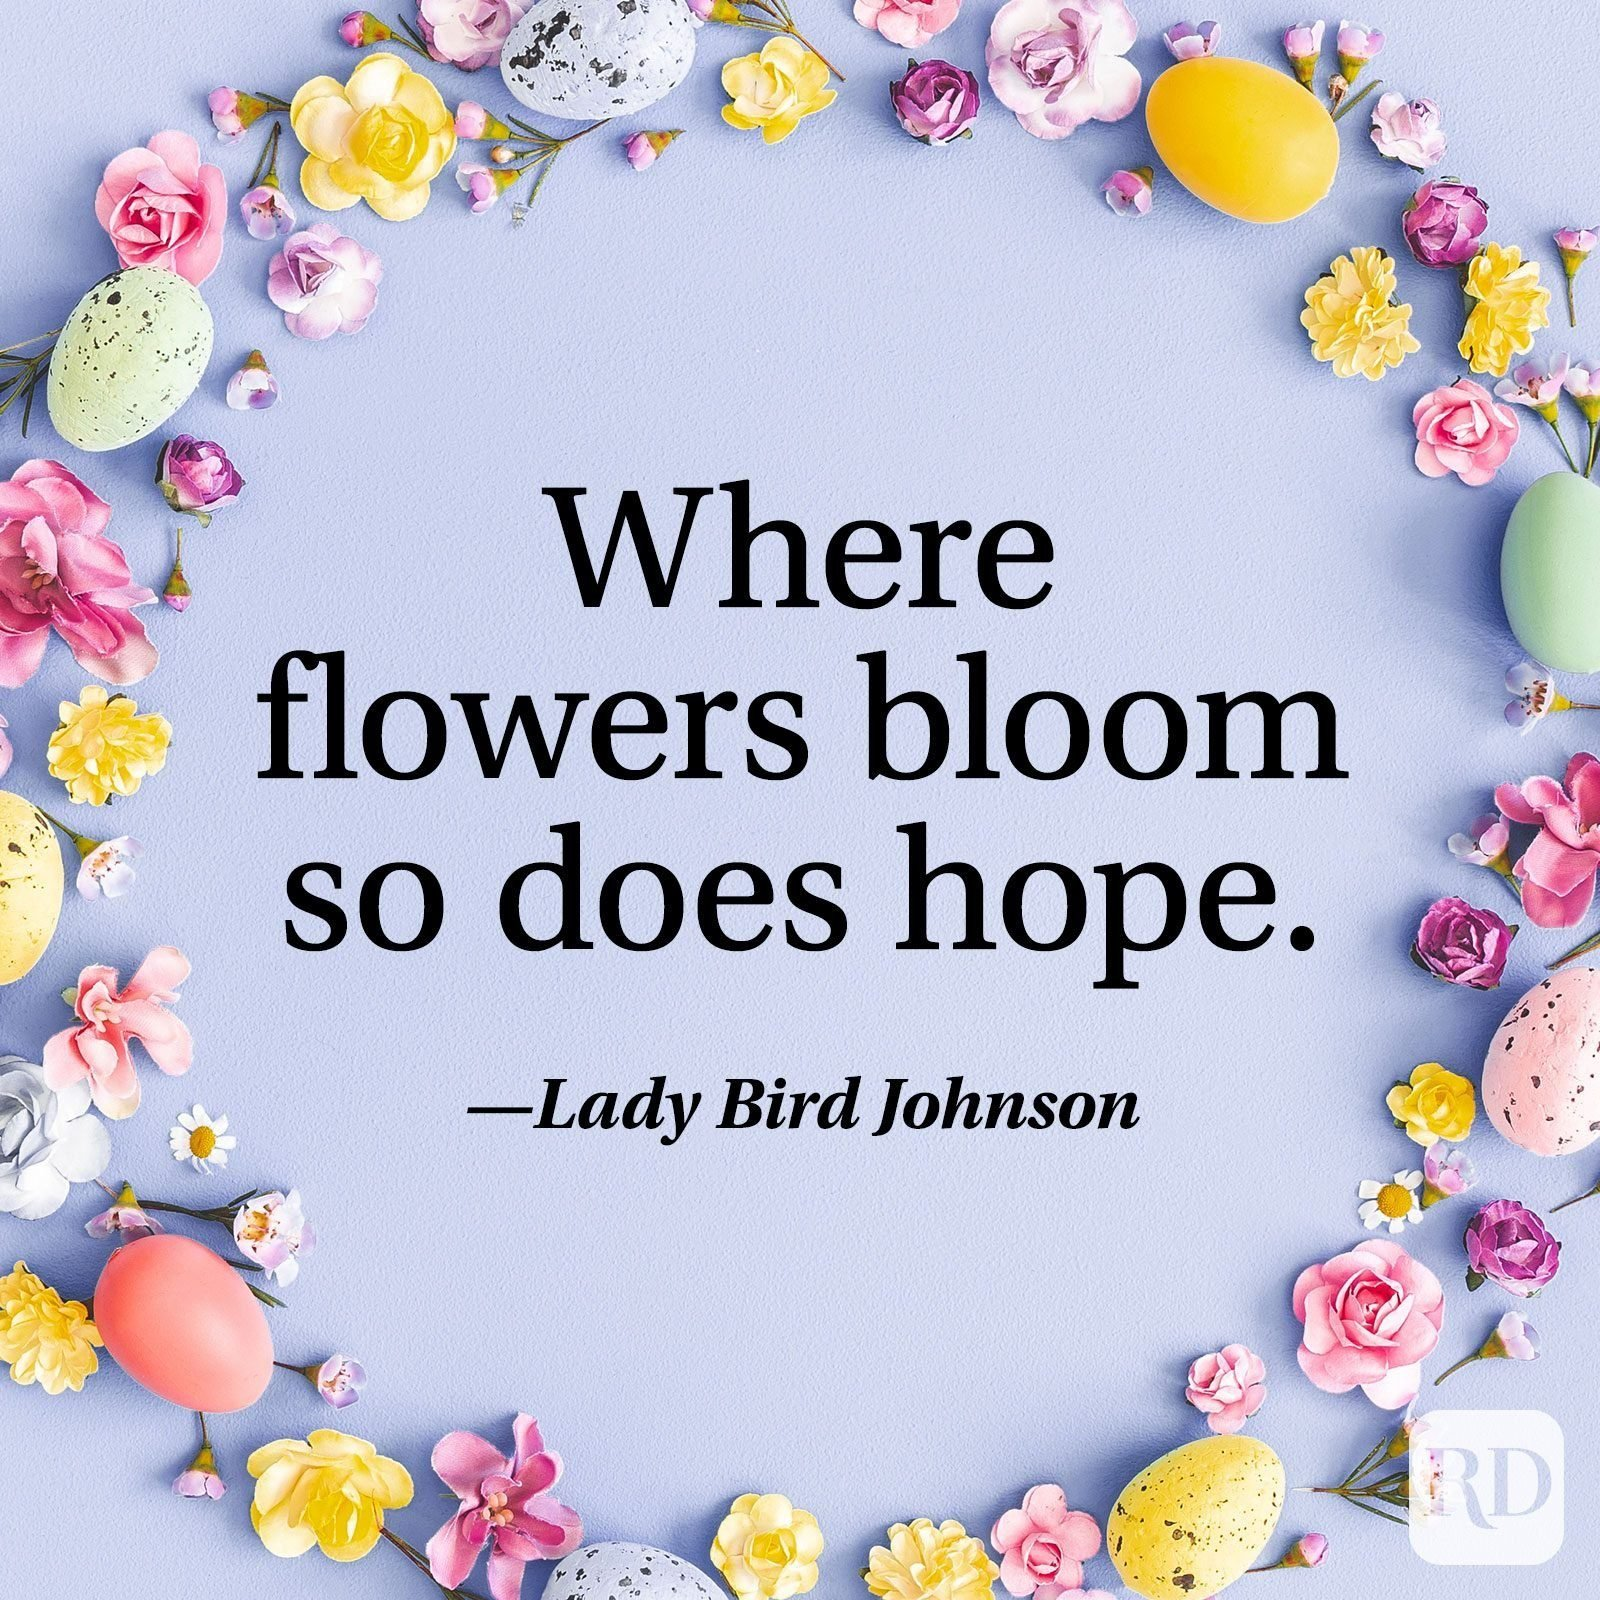 """Where flowers bloom so does hope."" — Lady Bird Johnson"